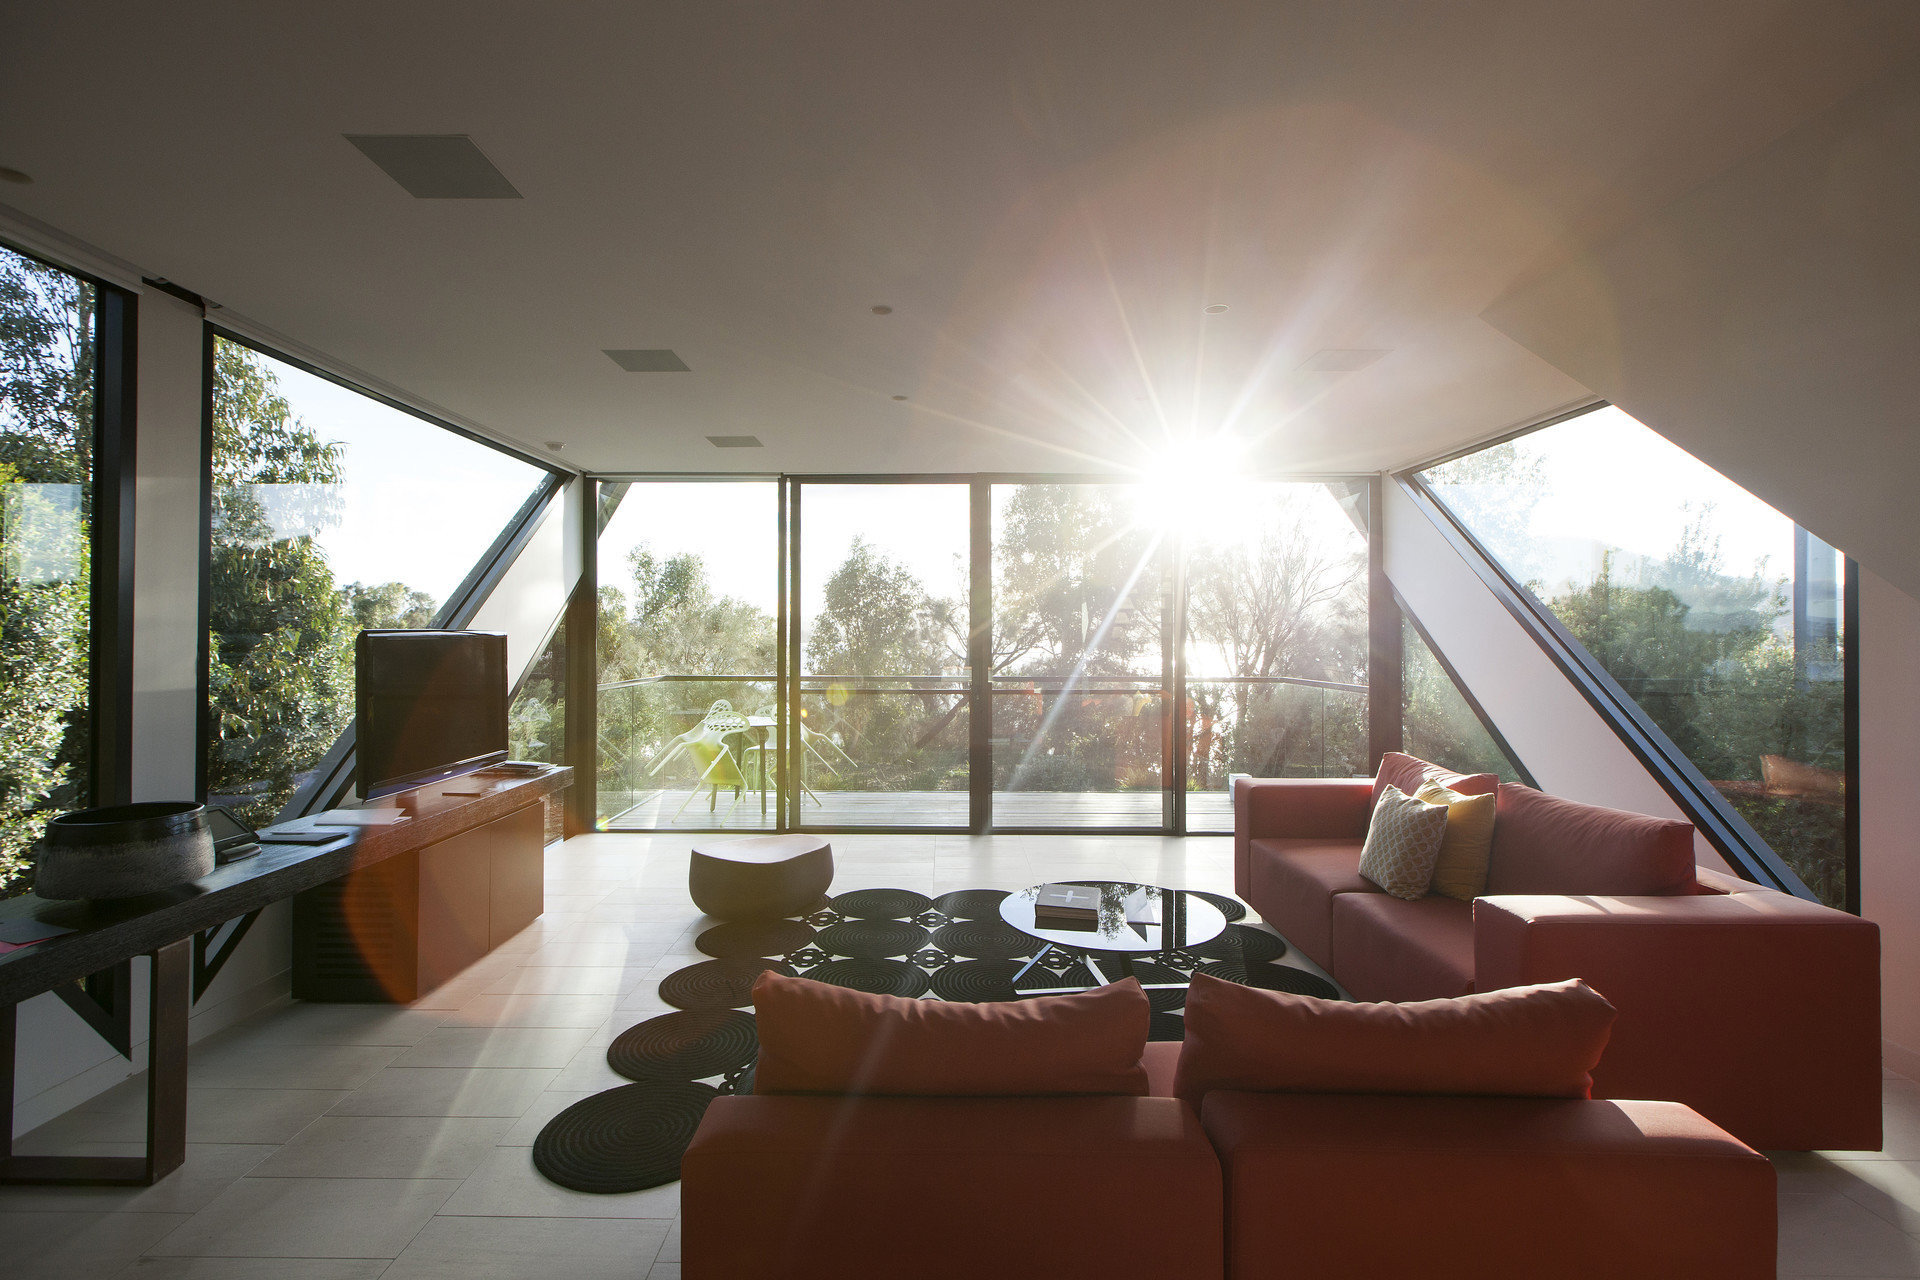 sofa property living room house home condominium daylighting Villa